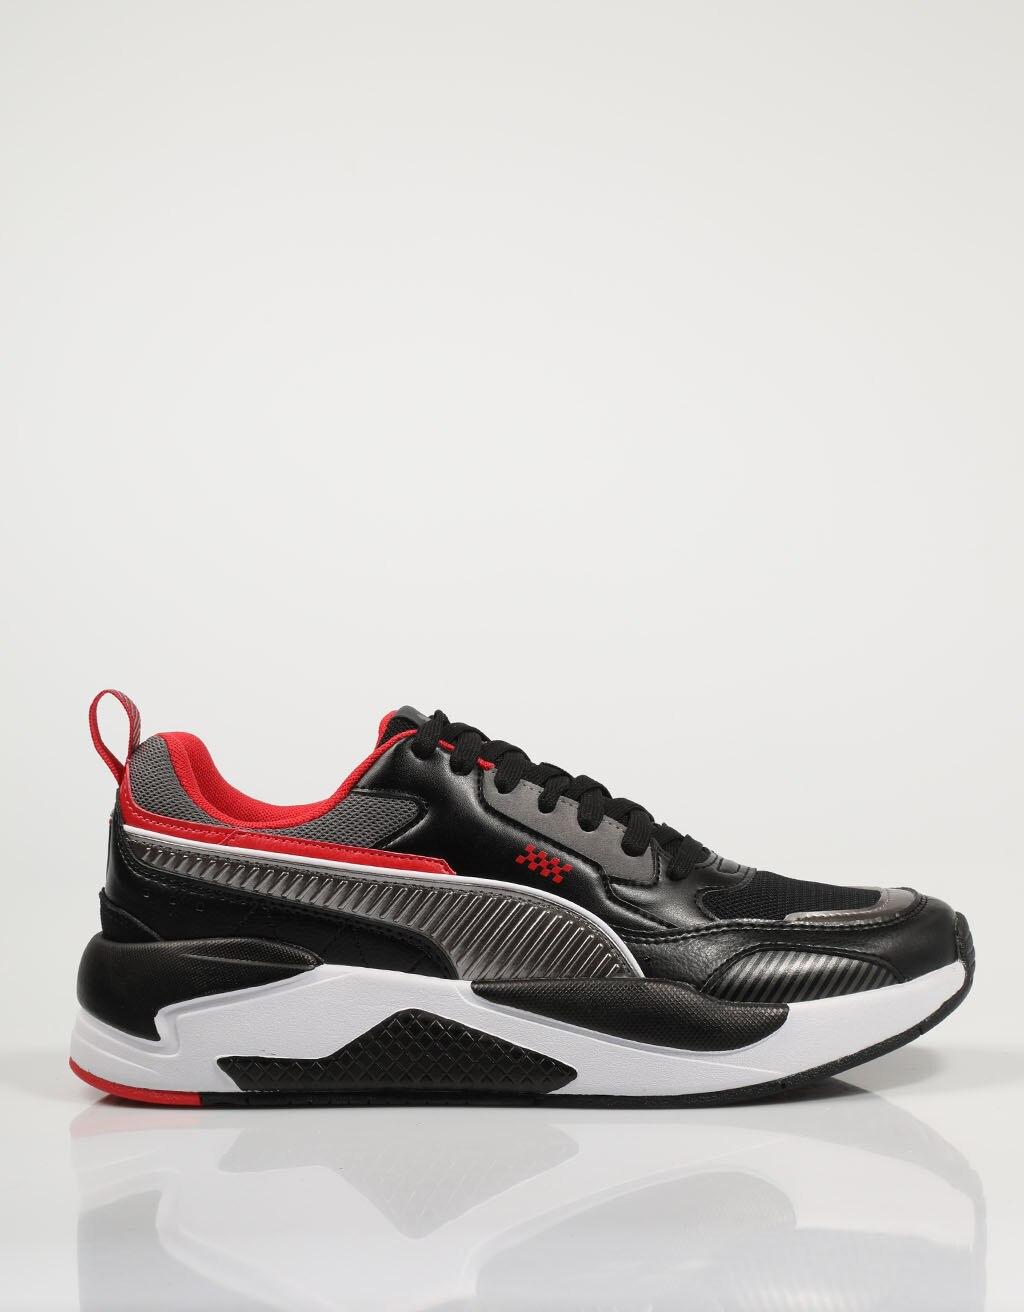 PUMA ZAPATILLAS FERRARI RACE X BLACK 30695301 Negro Polipiel Hombre – Black SNEAKERS Man Shoes Casual Fashion 76687